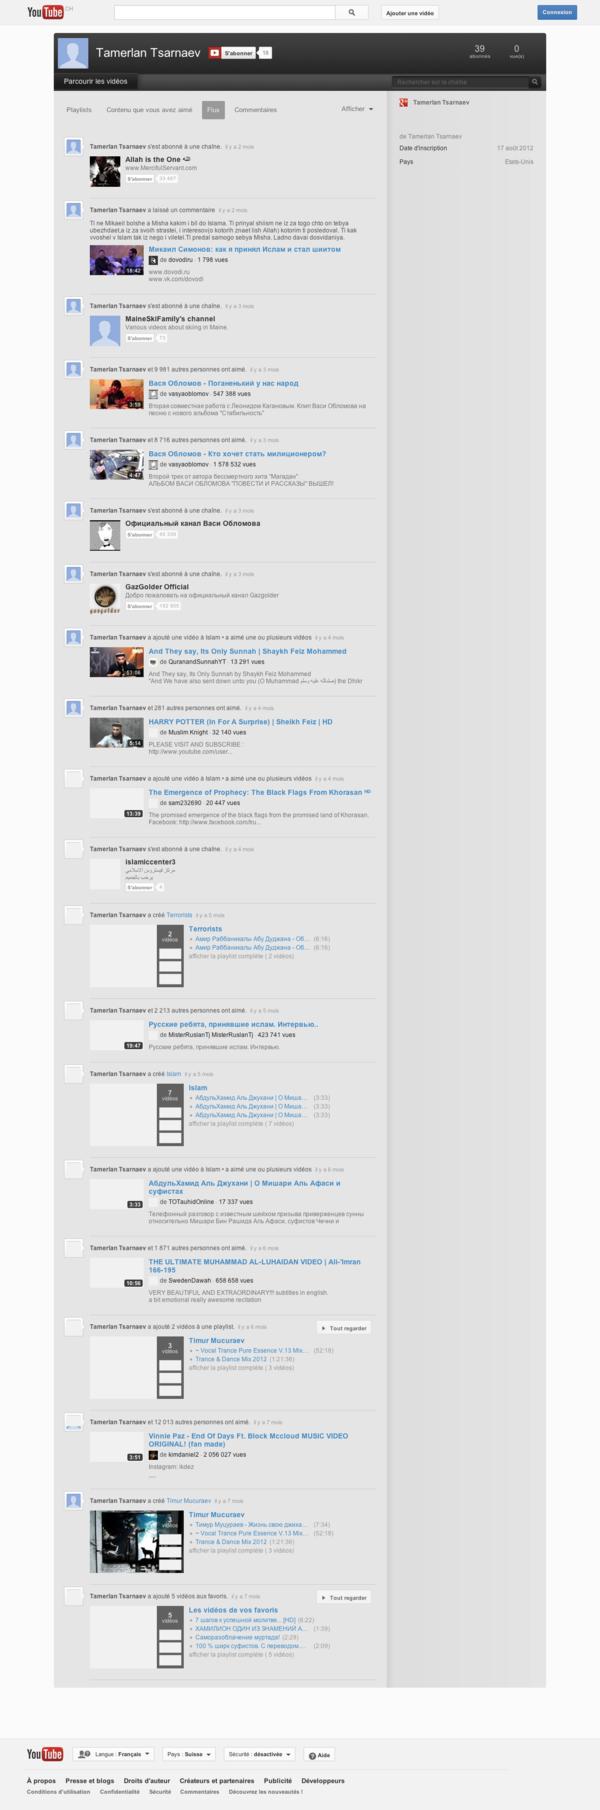 Tamelan_Tsarnaev_youtube_page